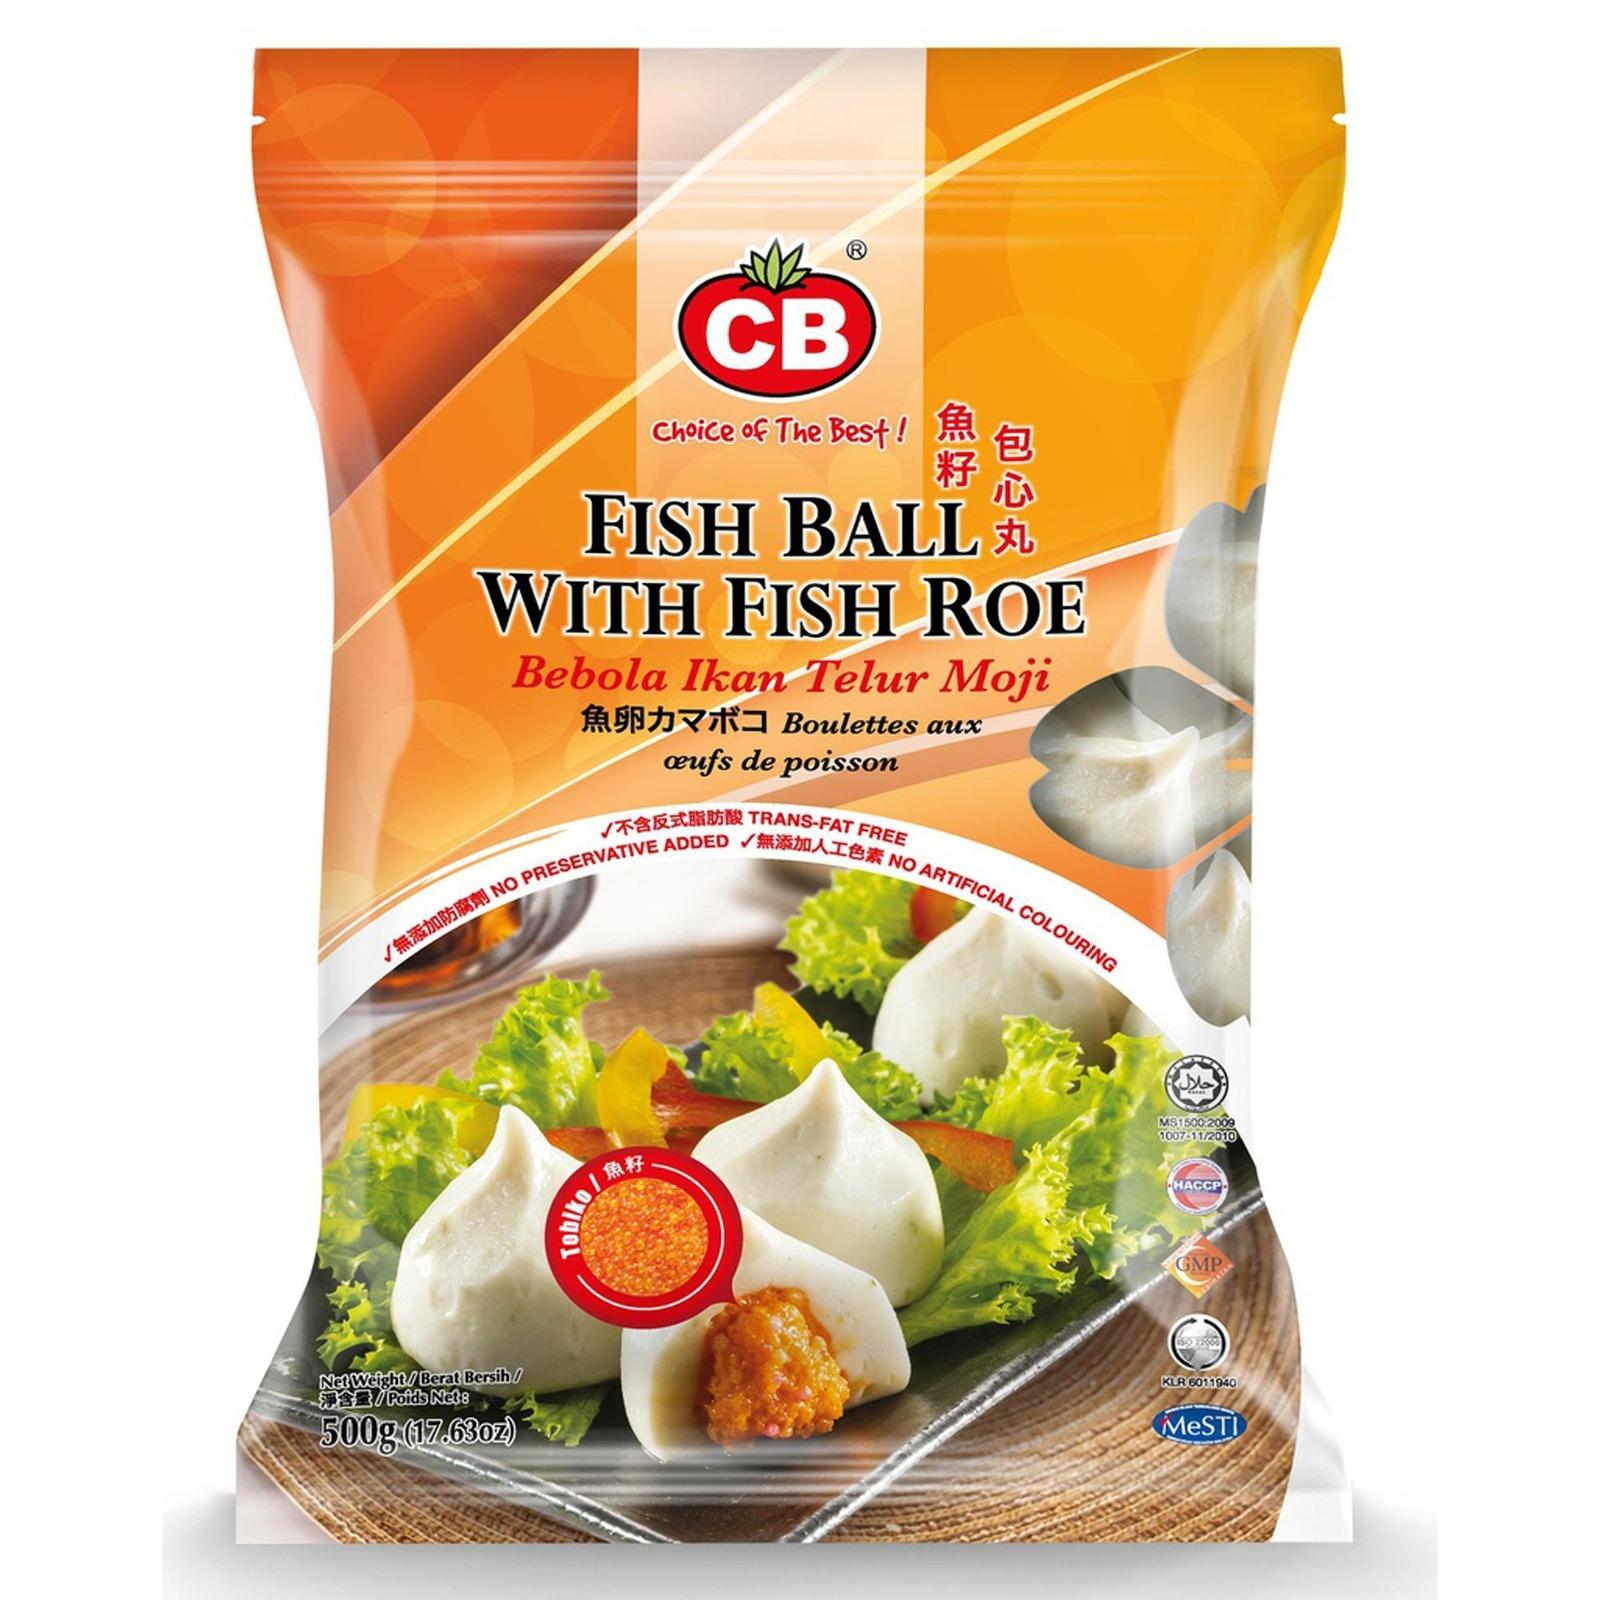 CB Fish Ball With Fish Roe 19Pcs